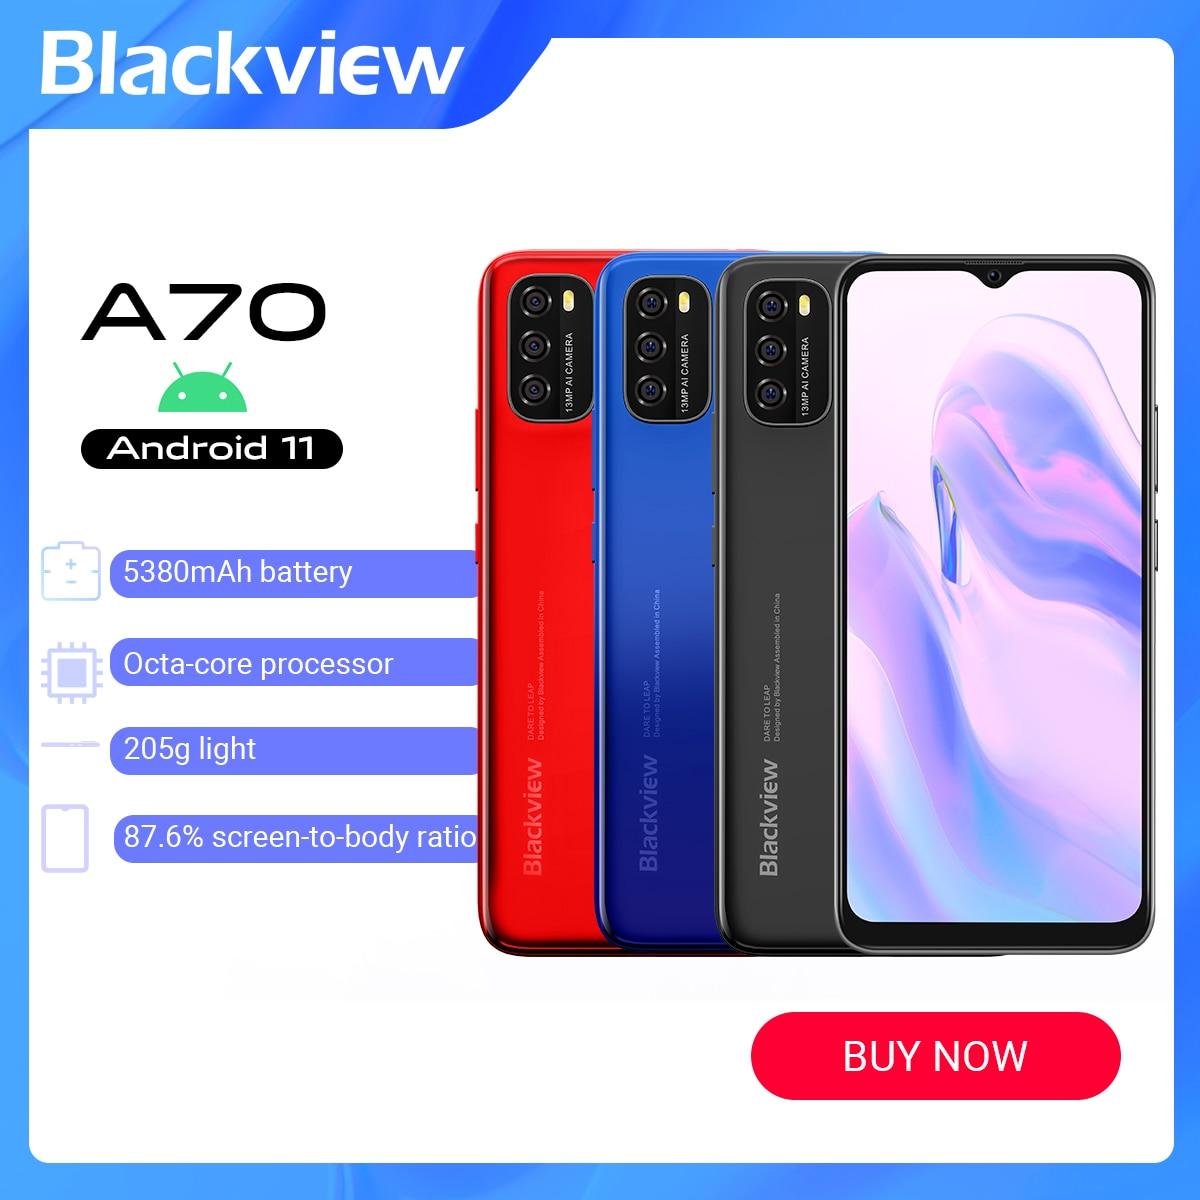 Blackview A70 الروبوت 11 3GB RAM + 32GB ROM 6.5 بوصة 4G الهاتف المحمول الثماني النواة 13MP الخلفية كاميرا 5380mAh GPS بصمة إفتح